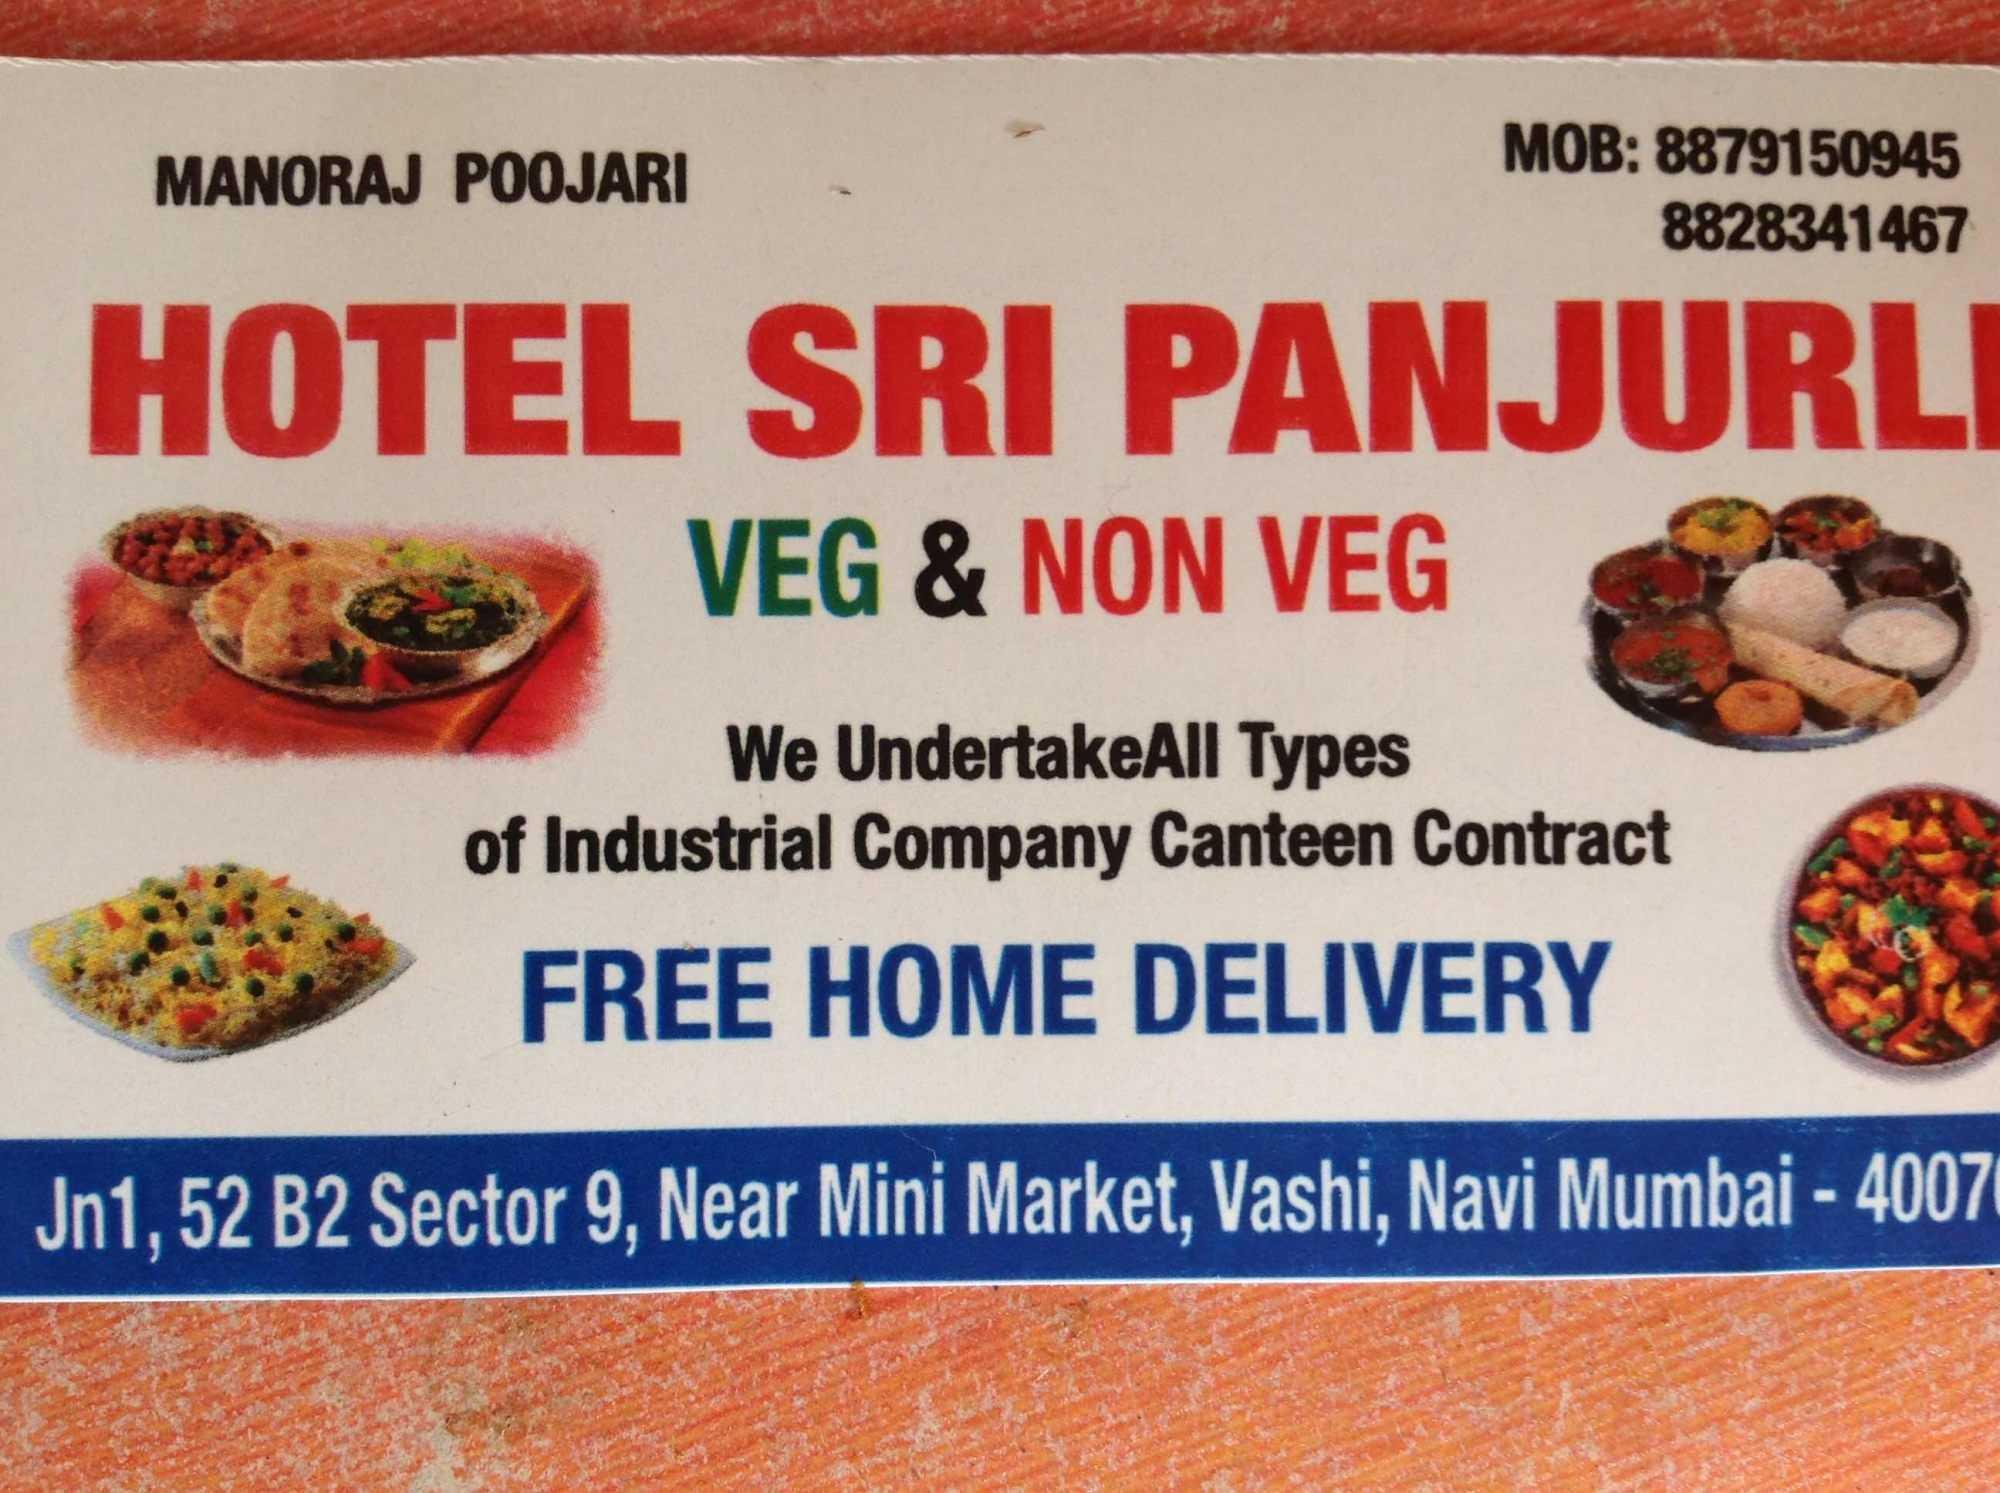 Incredible Fried Ken Restaurants Mumbai Home Delivery Restaurants Near Me Idea Gallery Restaurants That Deliver Near Me Still Open Restaurants That Deliver Near Me Open Now nice food Restaurants That Deliver Near Me